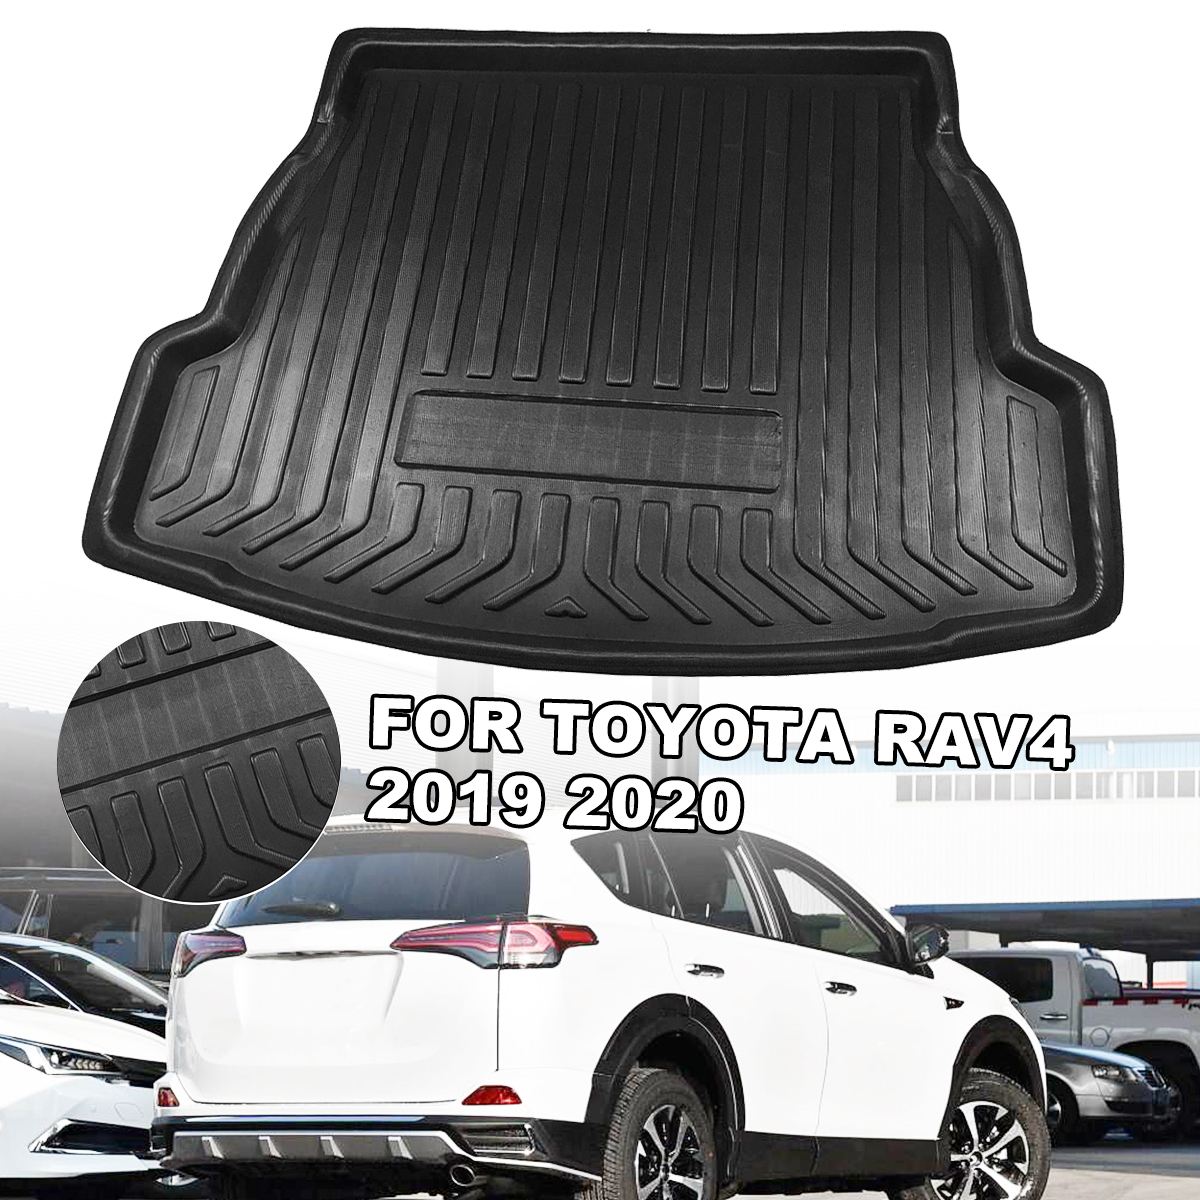 Exterior Parts for Toyota Rav4 2013 2014 2015 2016 2017 2018 Boot Mat Rear Trunk Liner Cargo Floor Carpet Mud Kick Protector Car Accessories